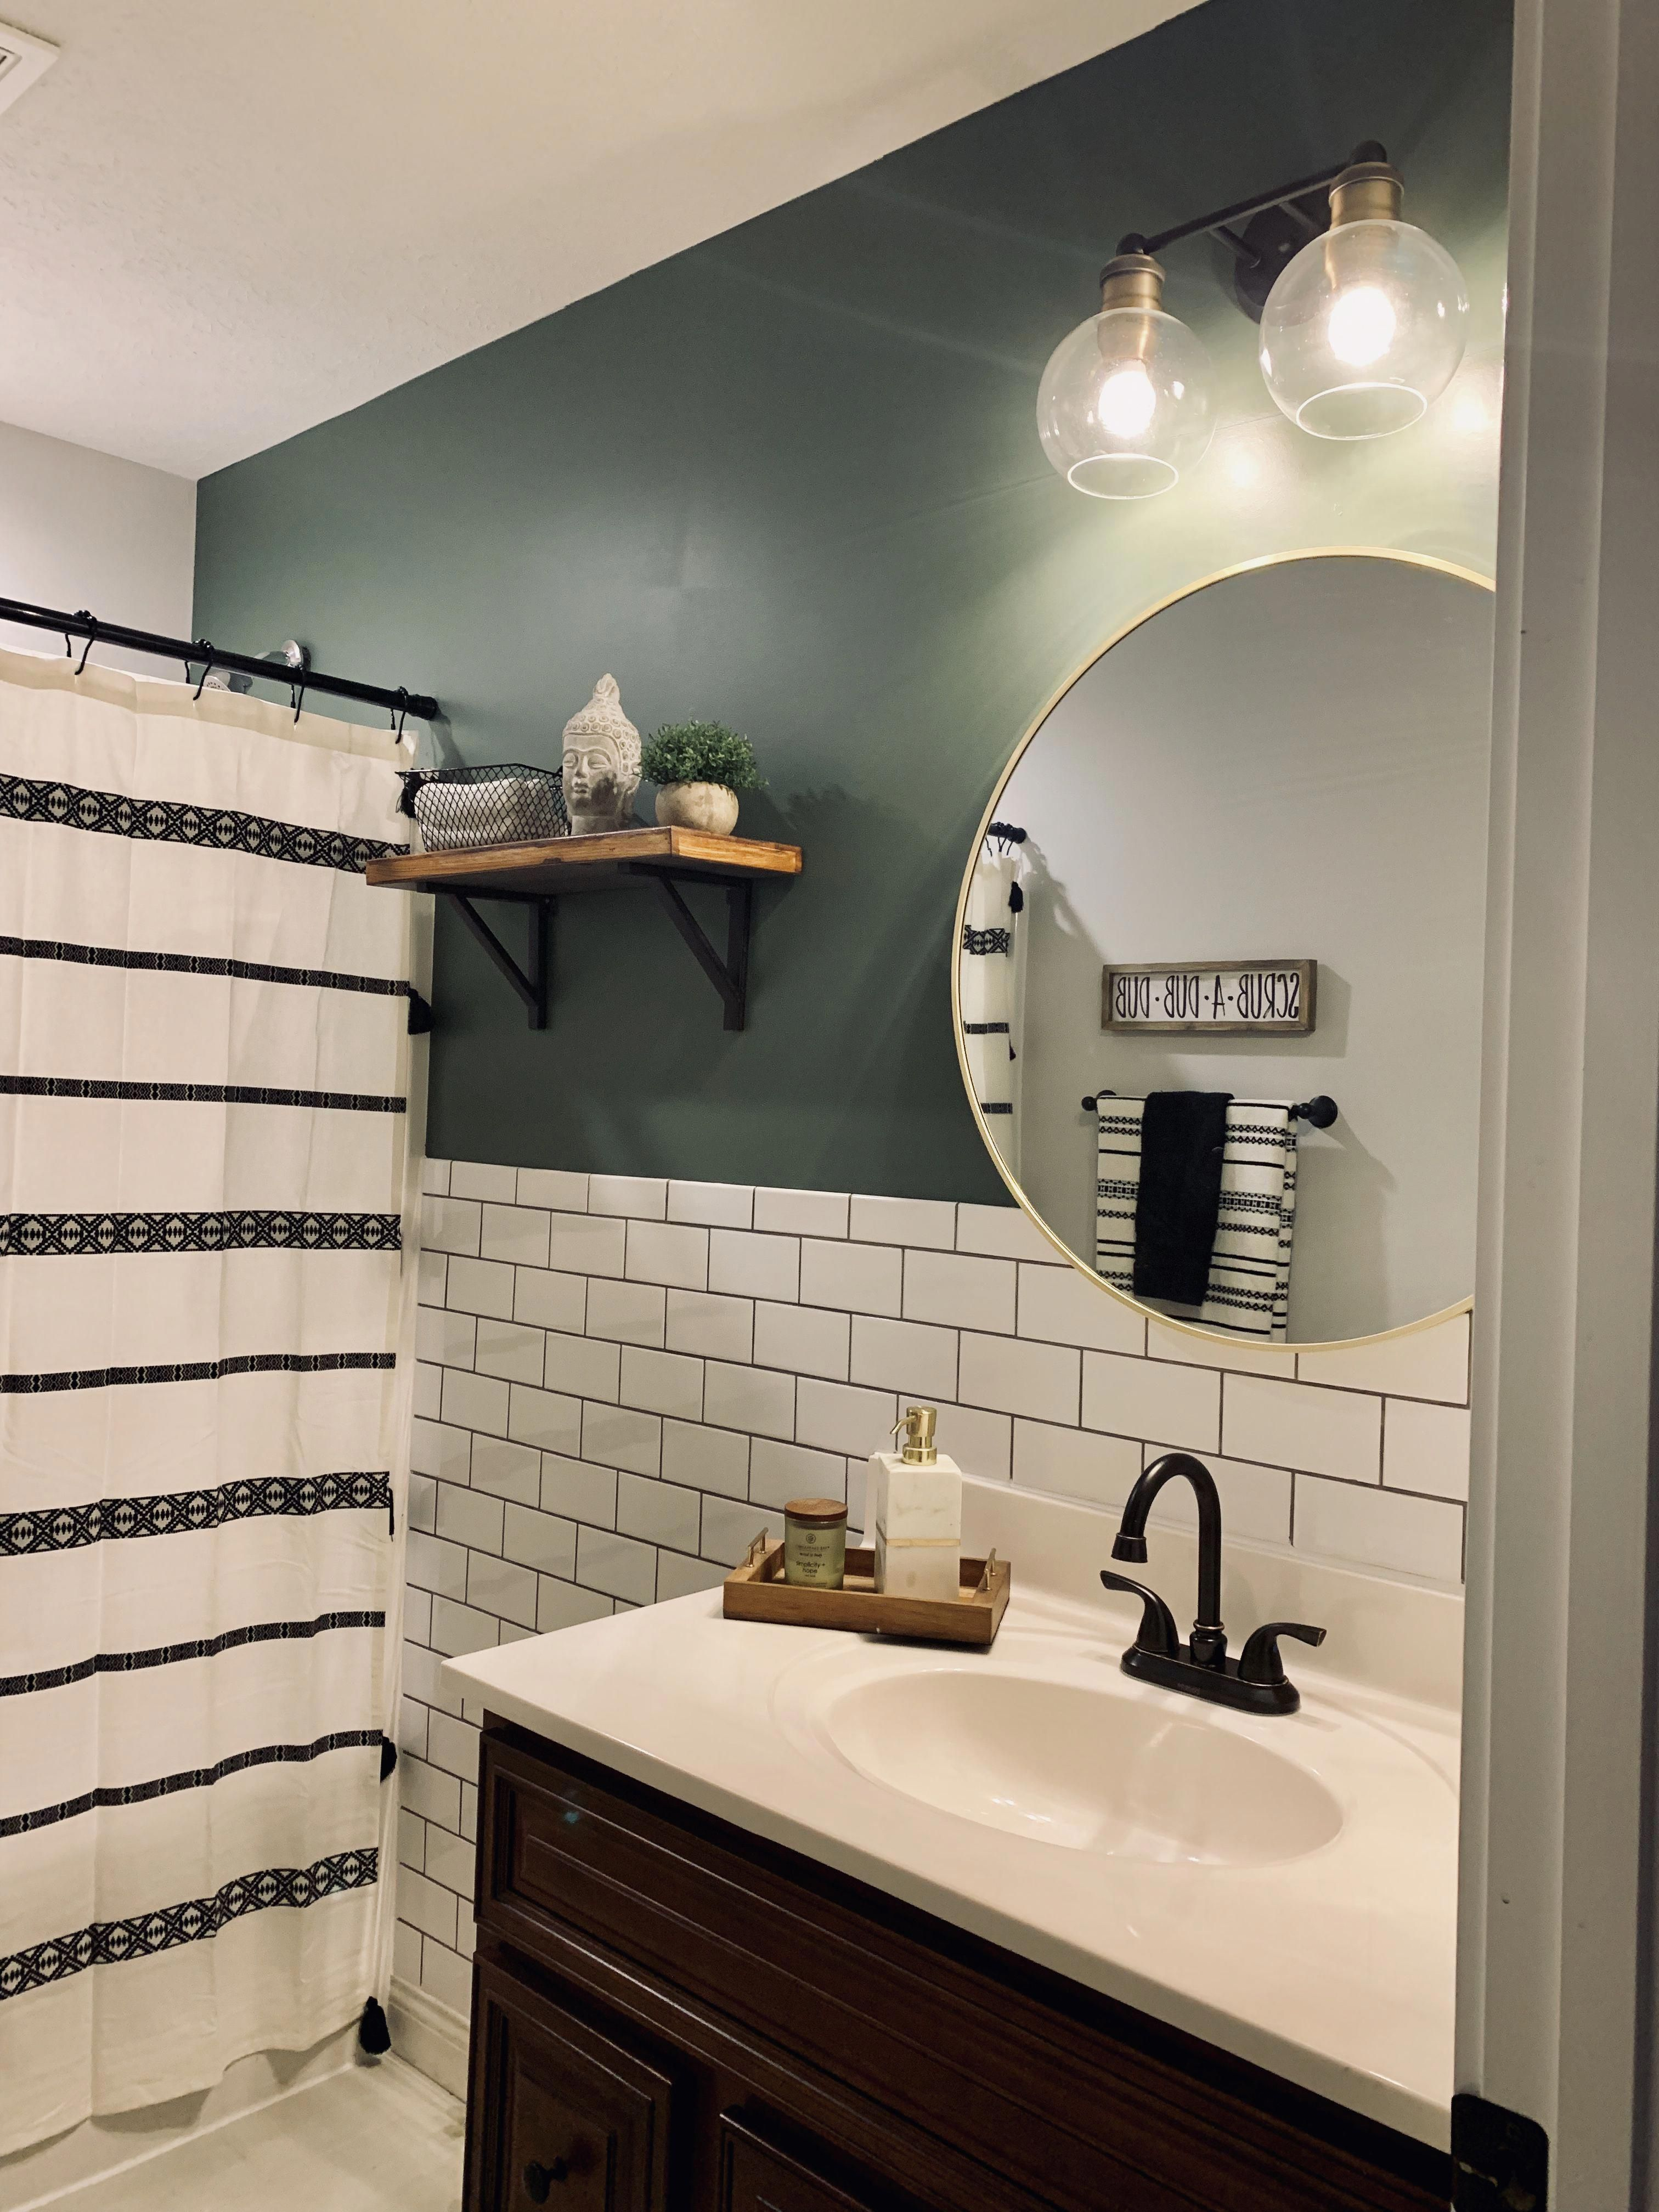 Pin On Home Inspo New bathroom backsplash ideas home